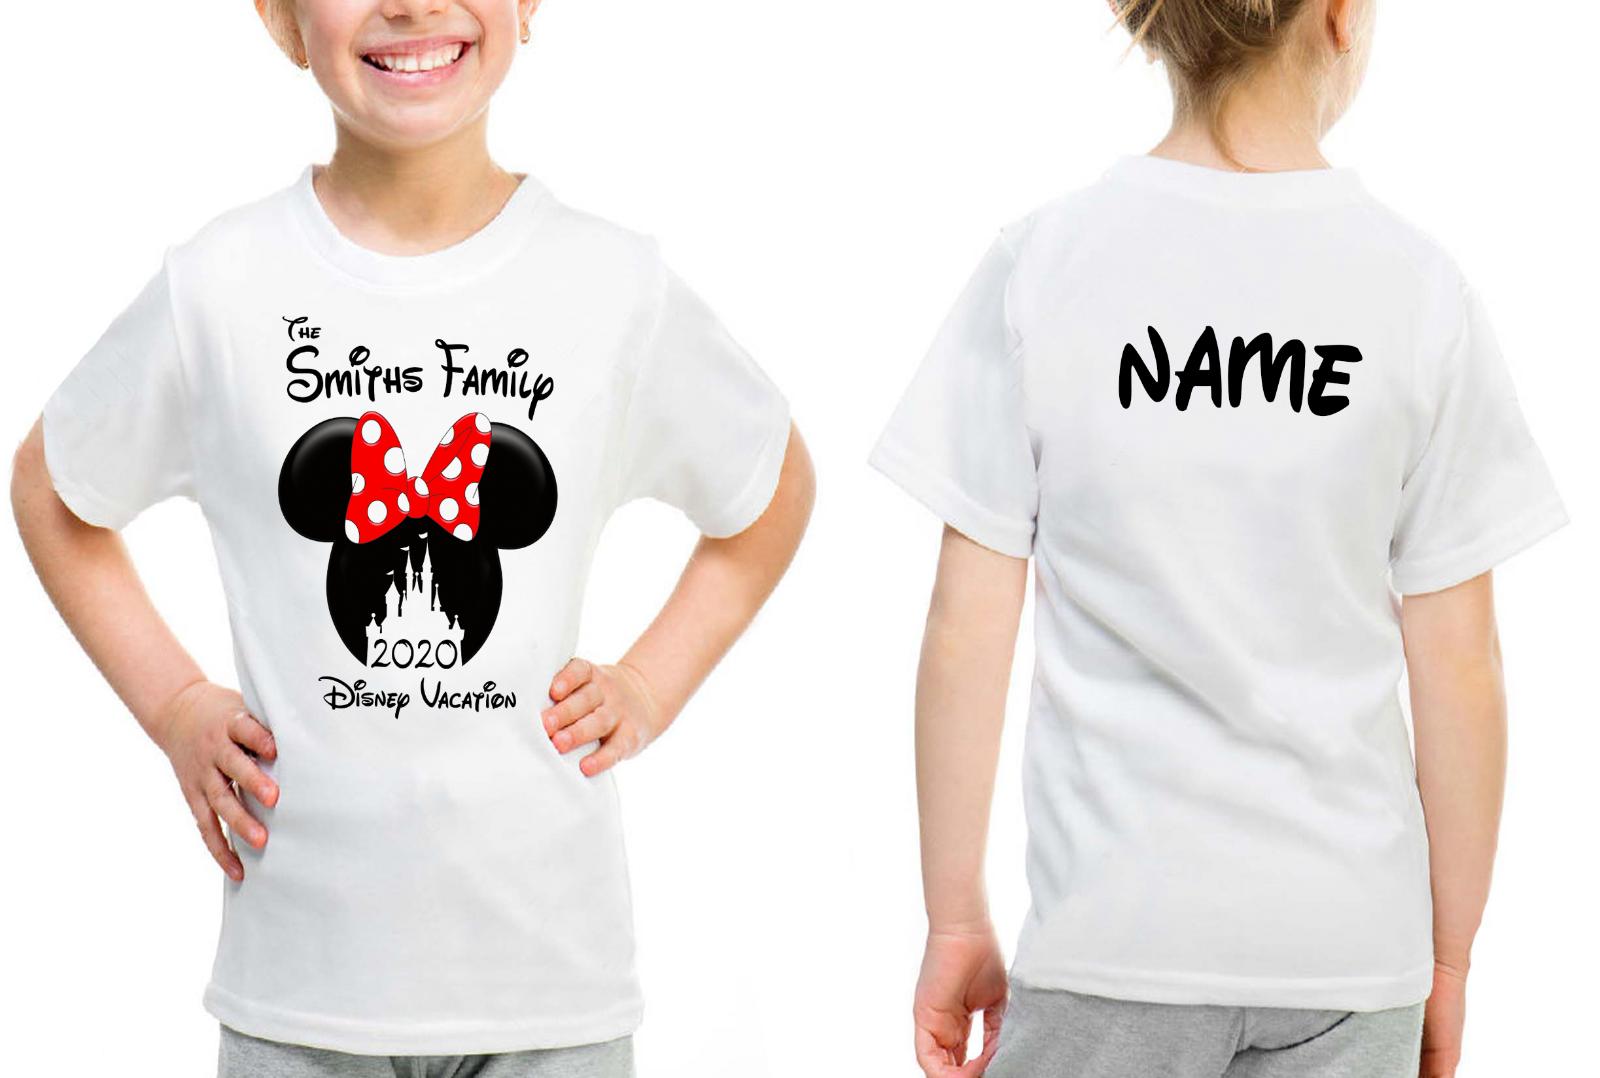 Personalised Minnie Mickey Mouse Disney 2020 Vacation T-Shirt Florida/Paris 2